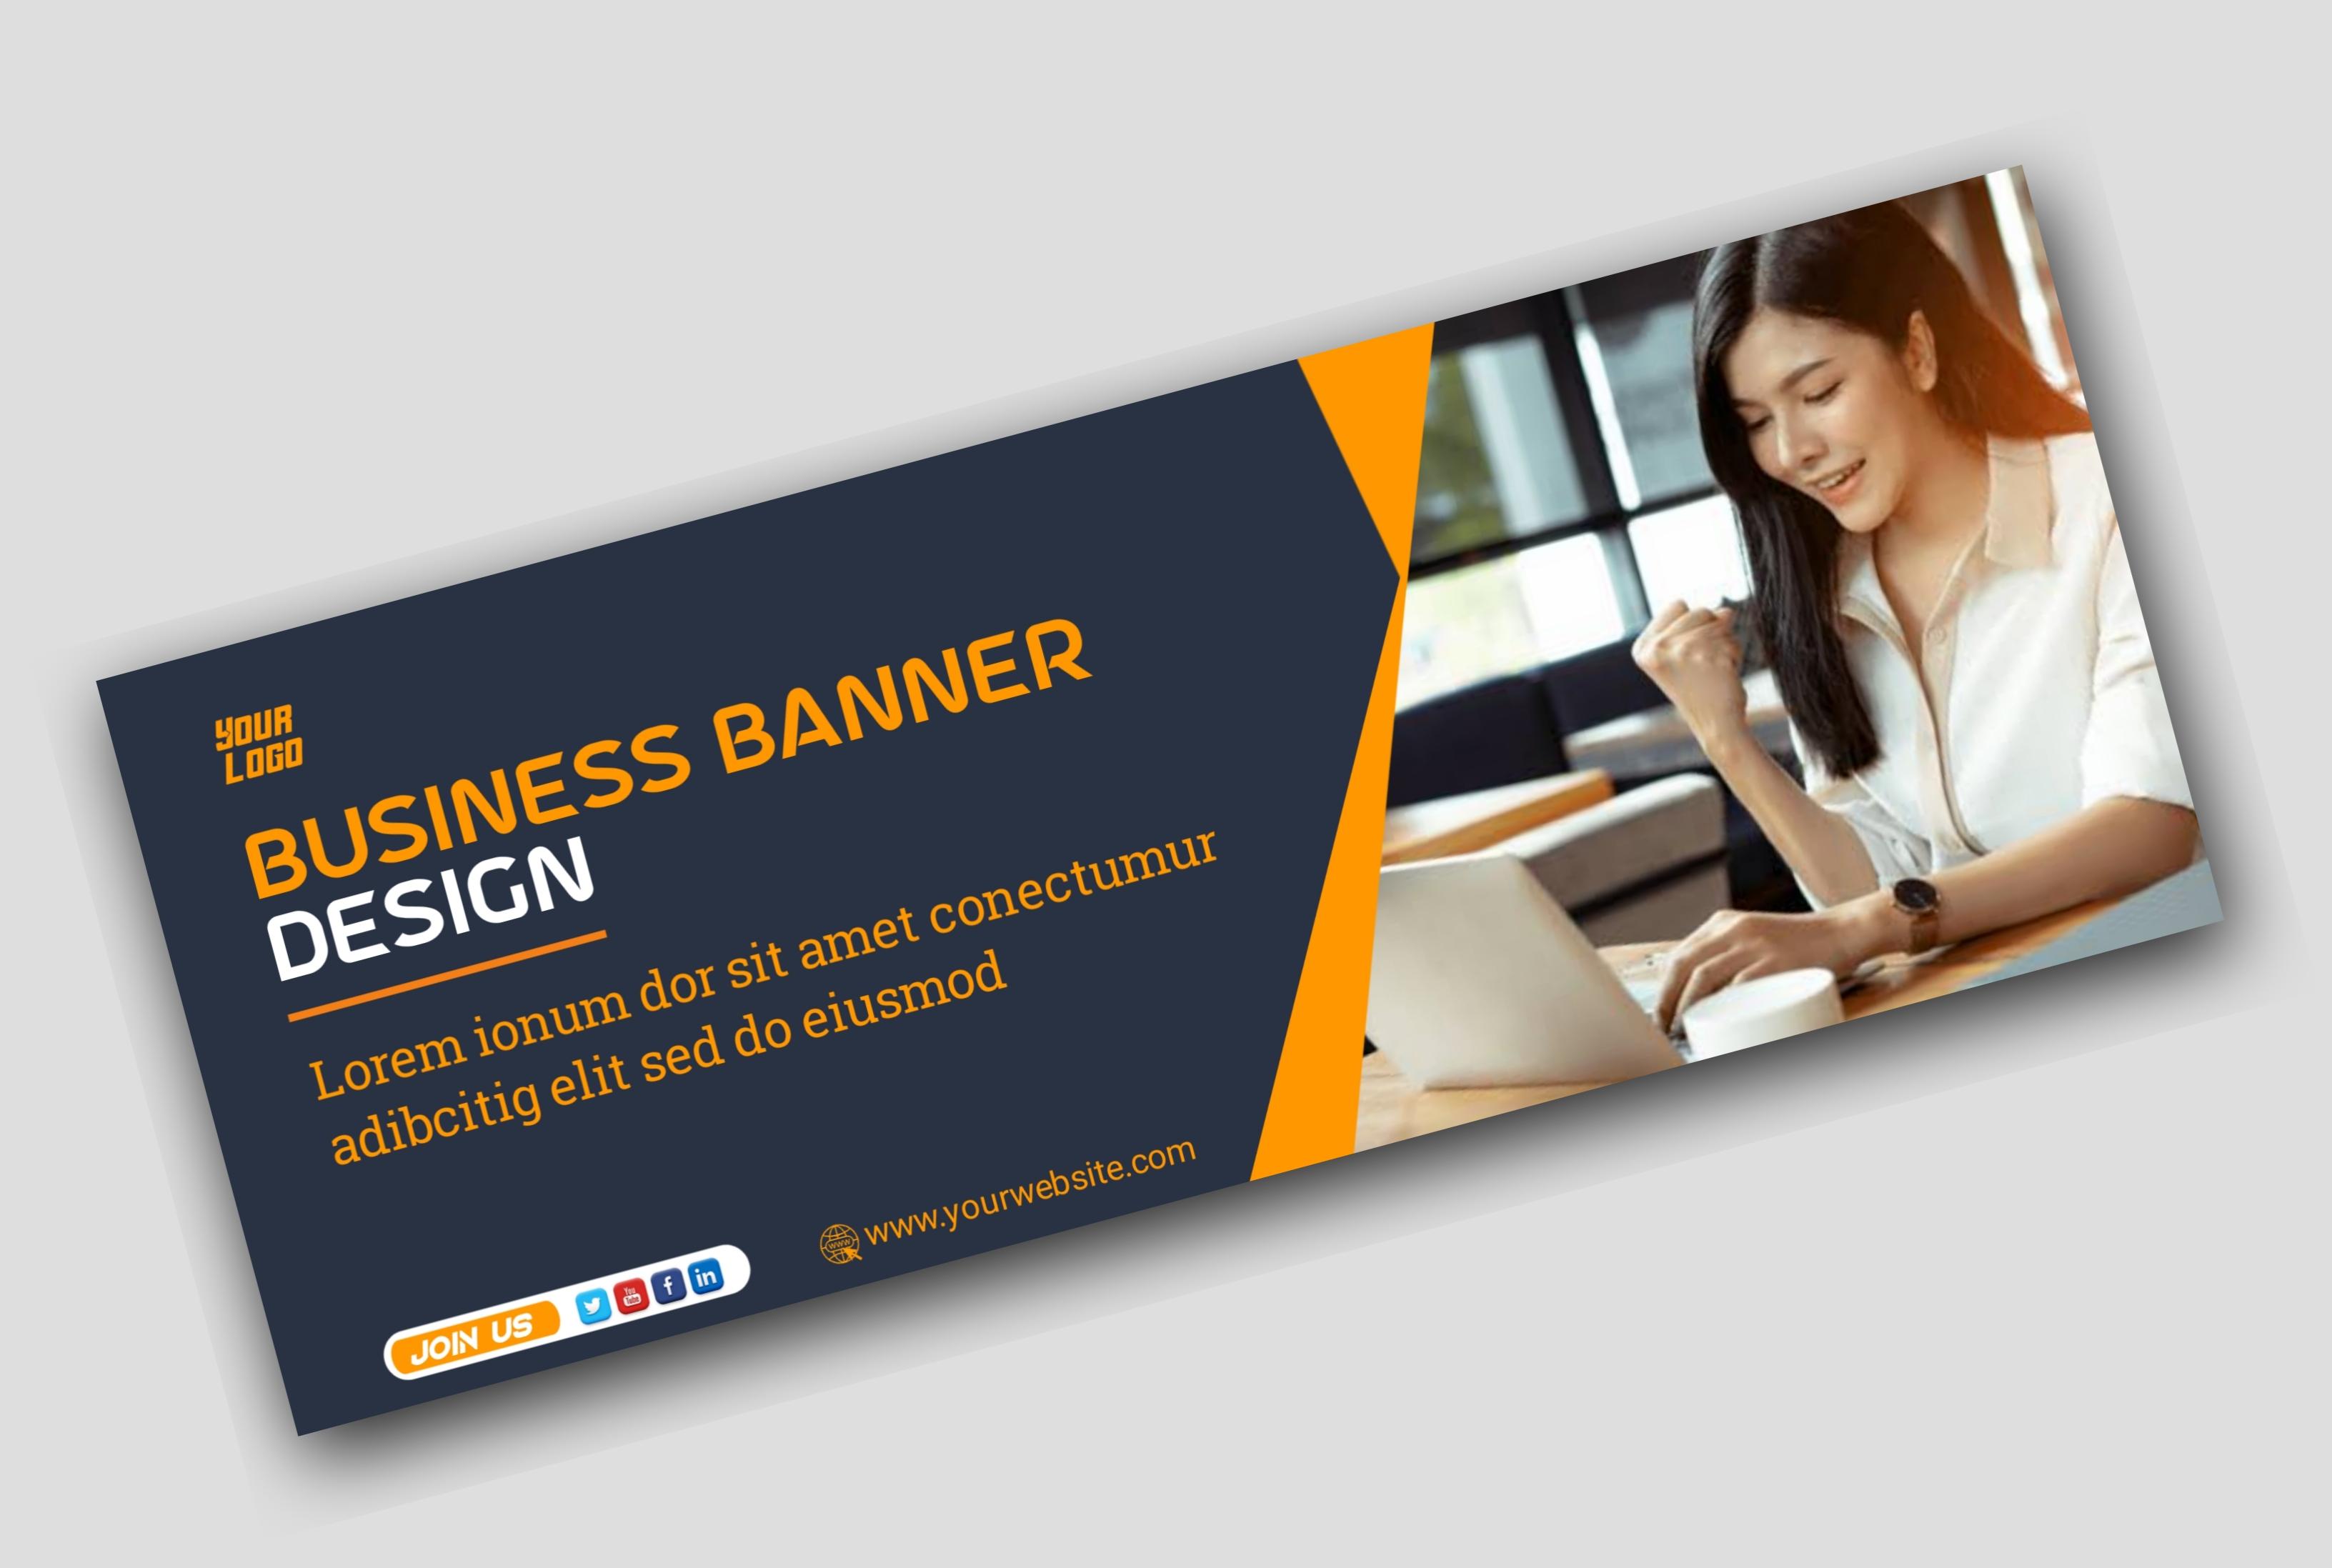 I will design social media banner, website banner.